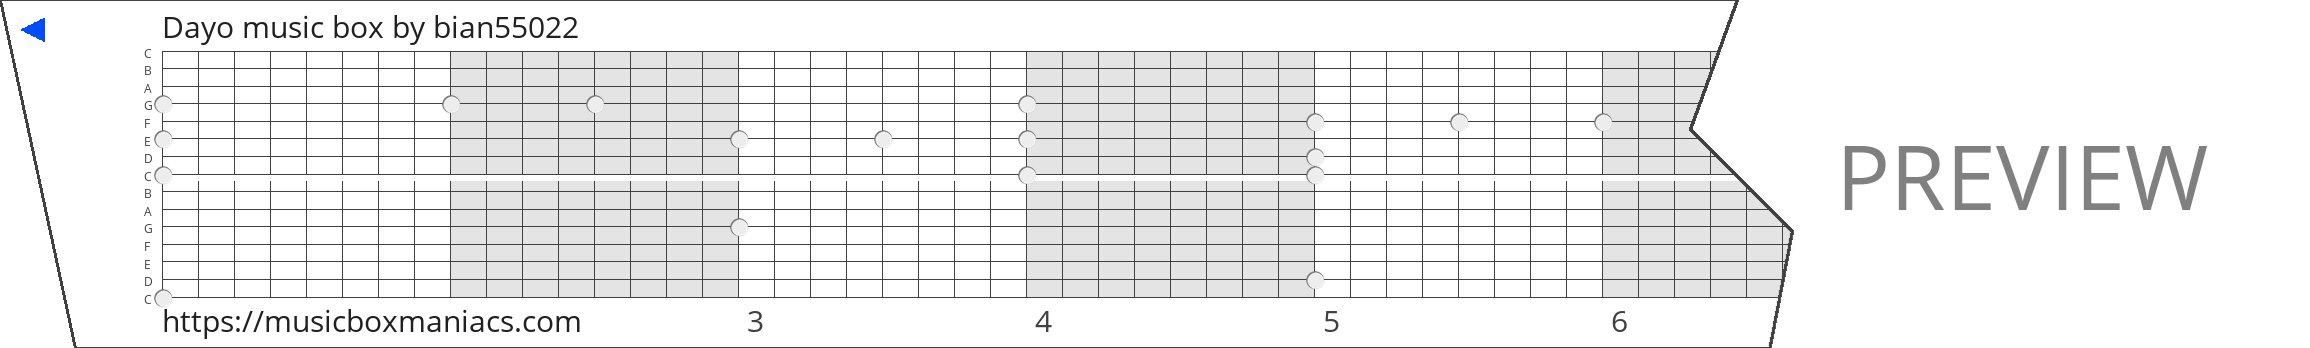 Dayo music box 15 note music box paper strip